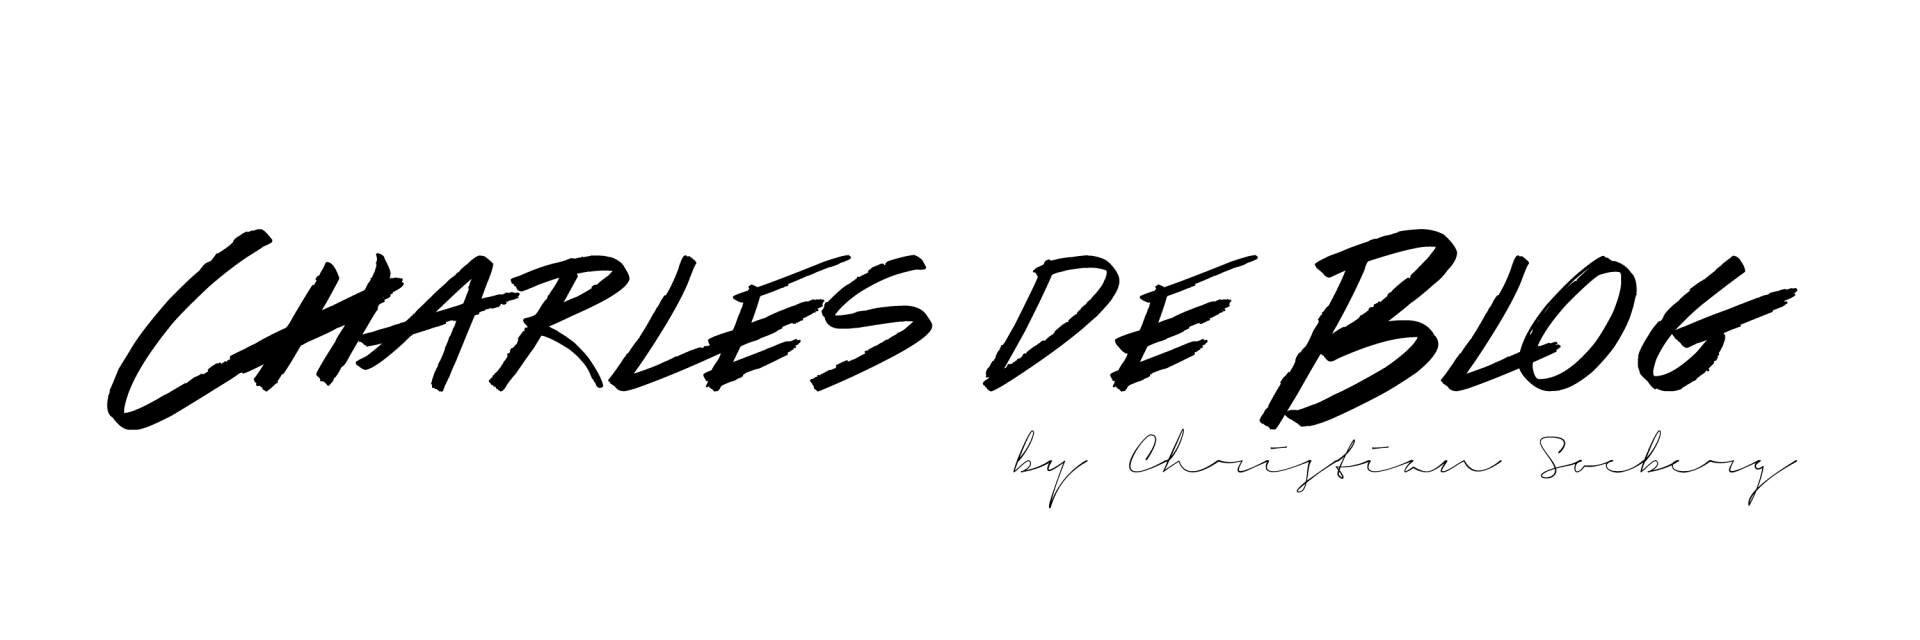 Charles de Blog